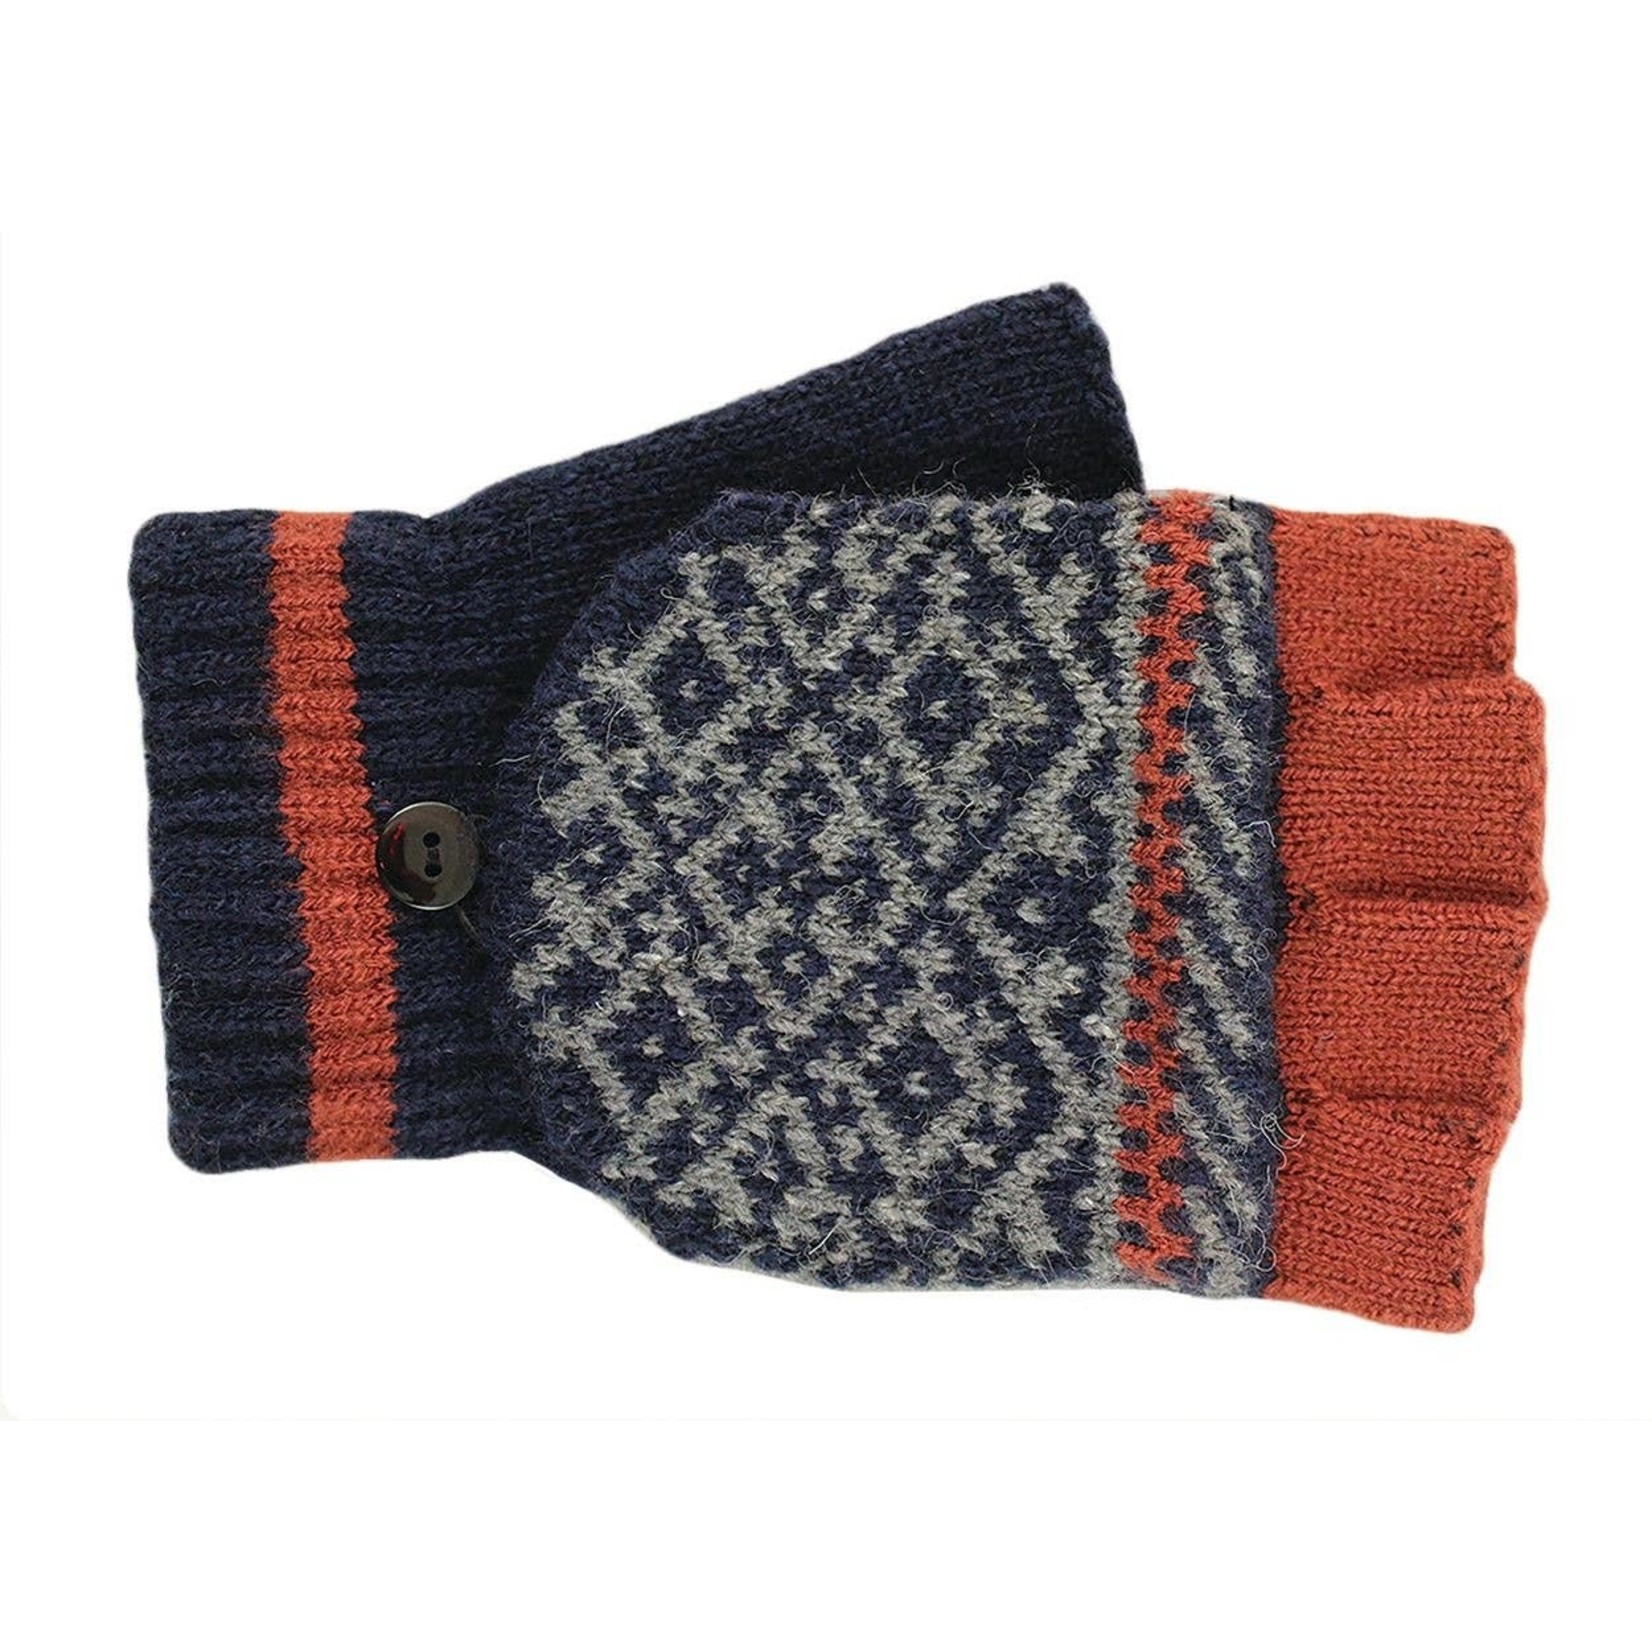 Jeanne Simmons Fingerless Glove w/ Mitten Cap in Navy/Rust Multi